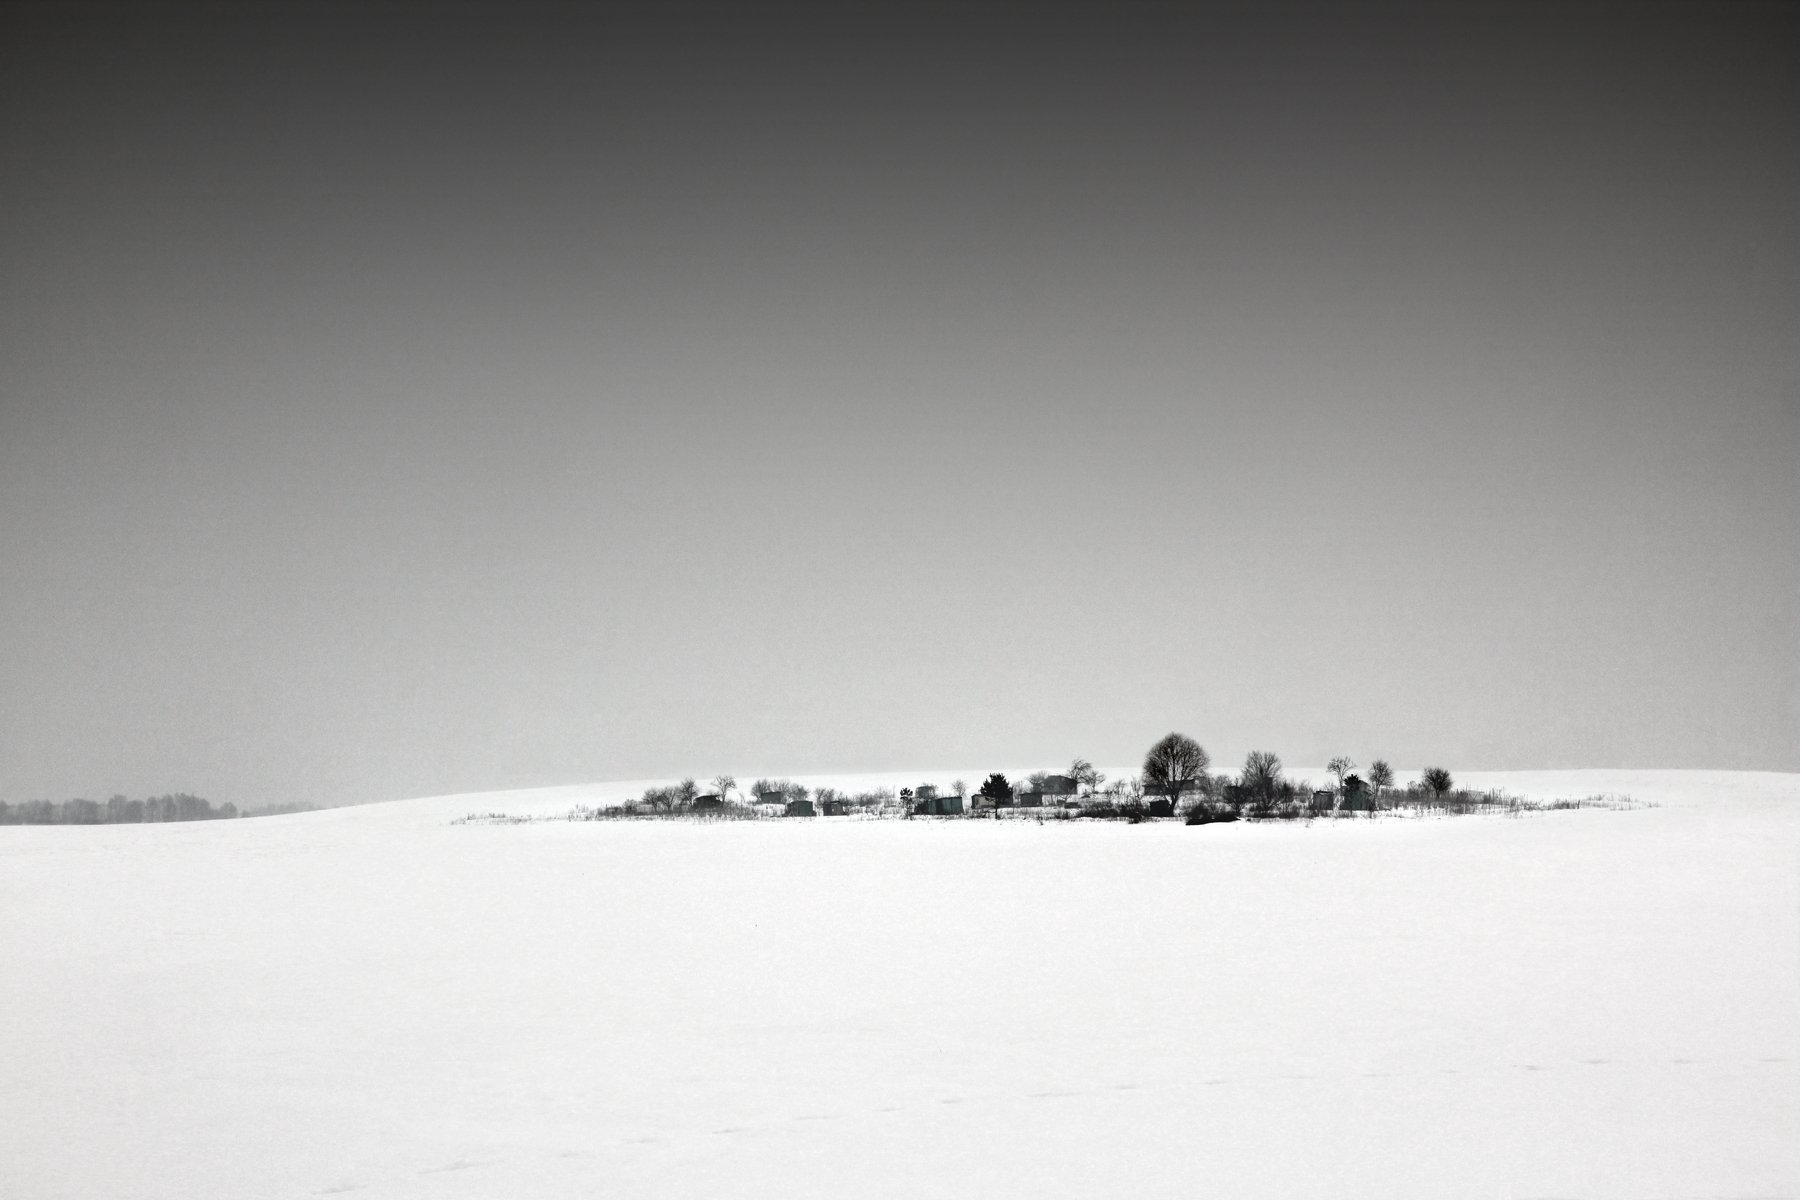 зима снег, Иванчиков Дмитрий